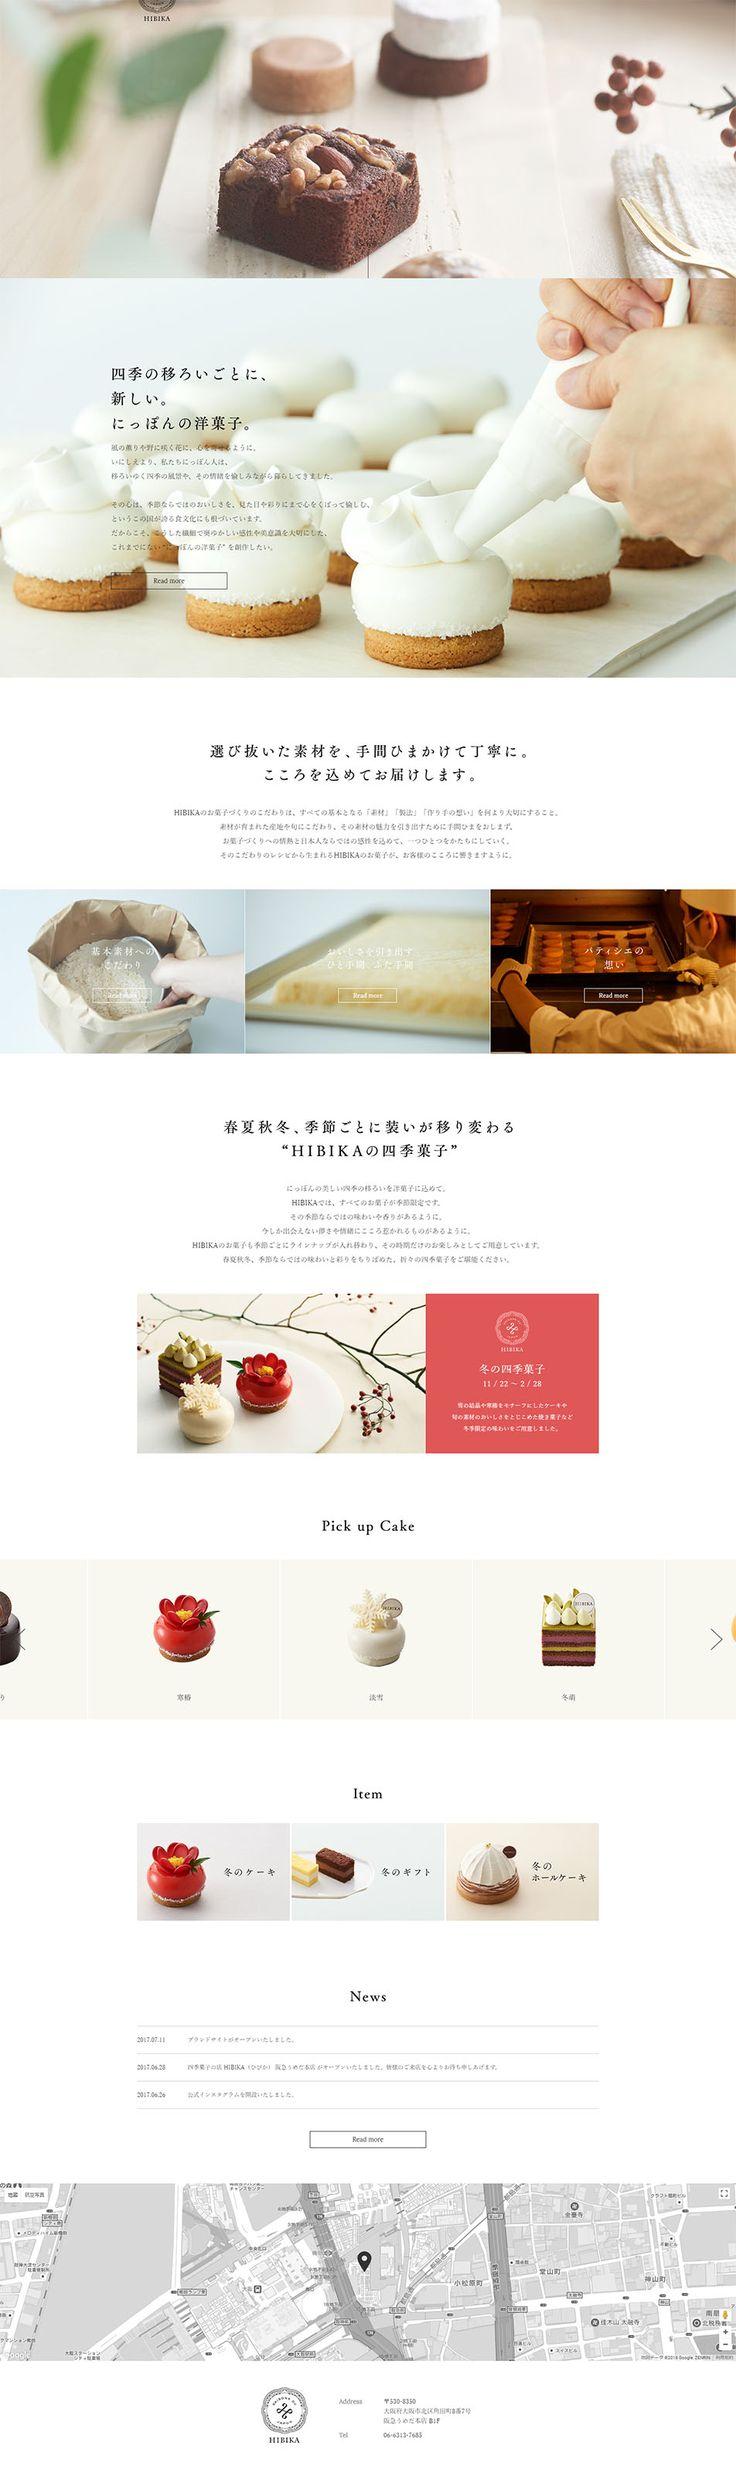 HIBIKA様の「HIBIKA」のランディングページ(LP)シンプル系|スイーツ・スナック菓子 #LP #ランディングページ #ランペ #HIBIKA